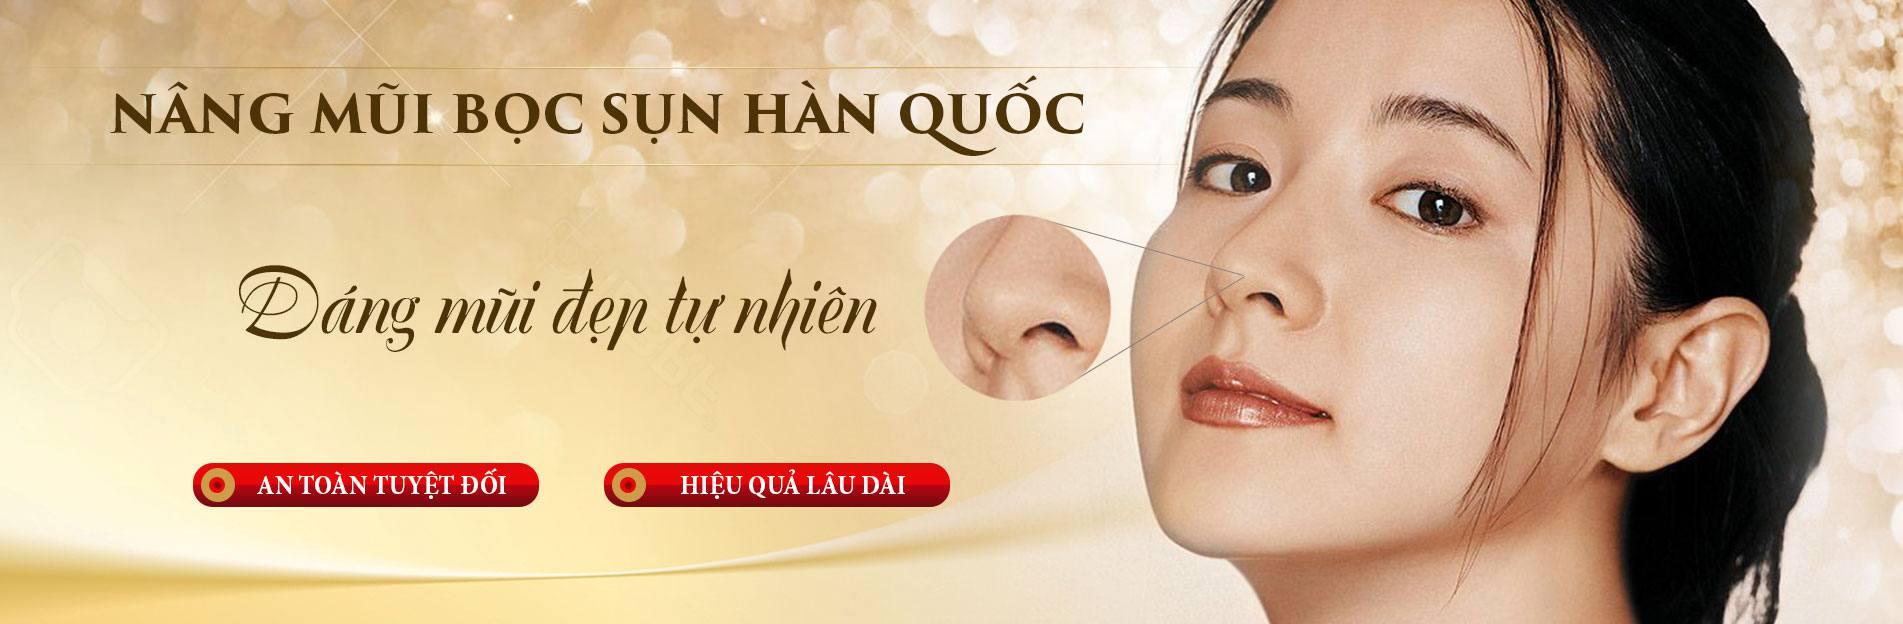 banner-nang-mui-boc-sun-han-quoc-web-ve-tinh